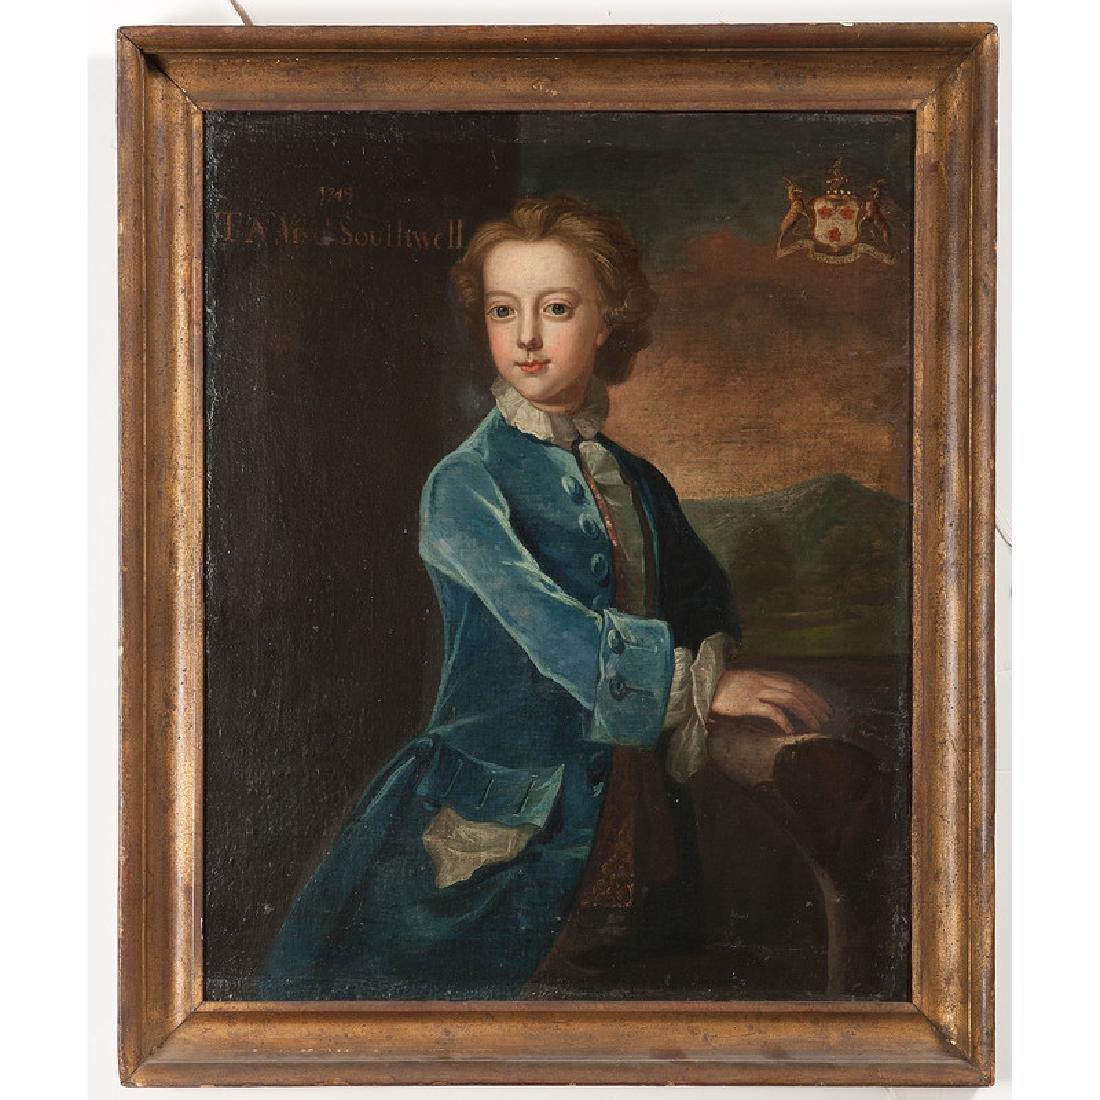 Irish School, 18th century, Portrait of Thomas - 2